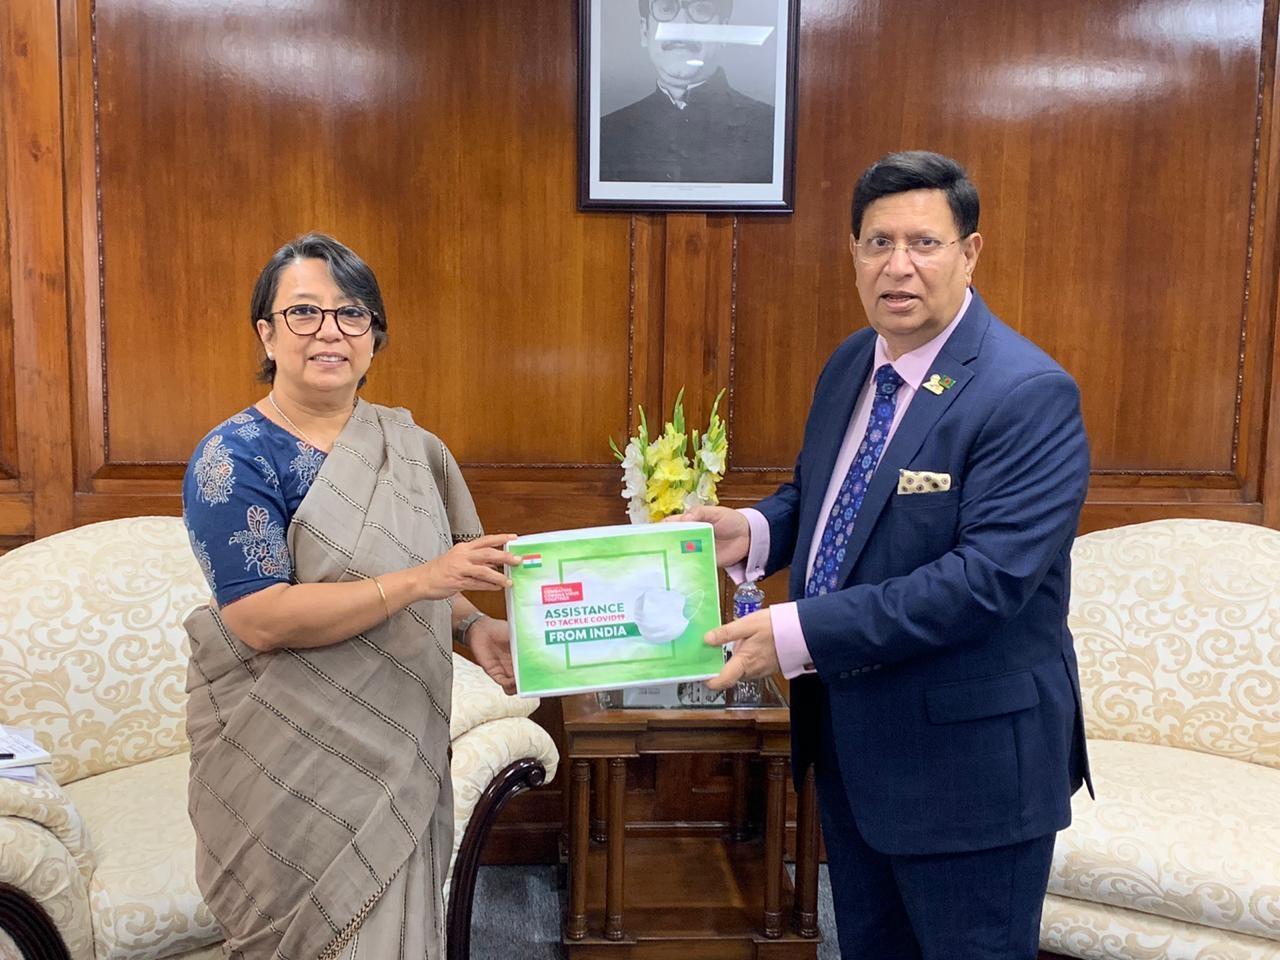 Covid-19: India provides protection items to Bangladesh